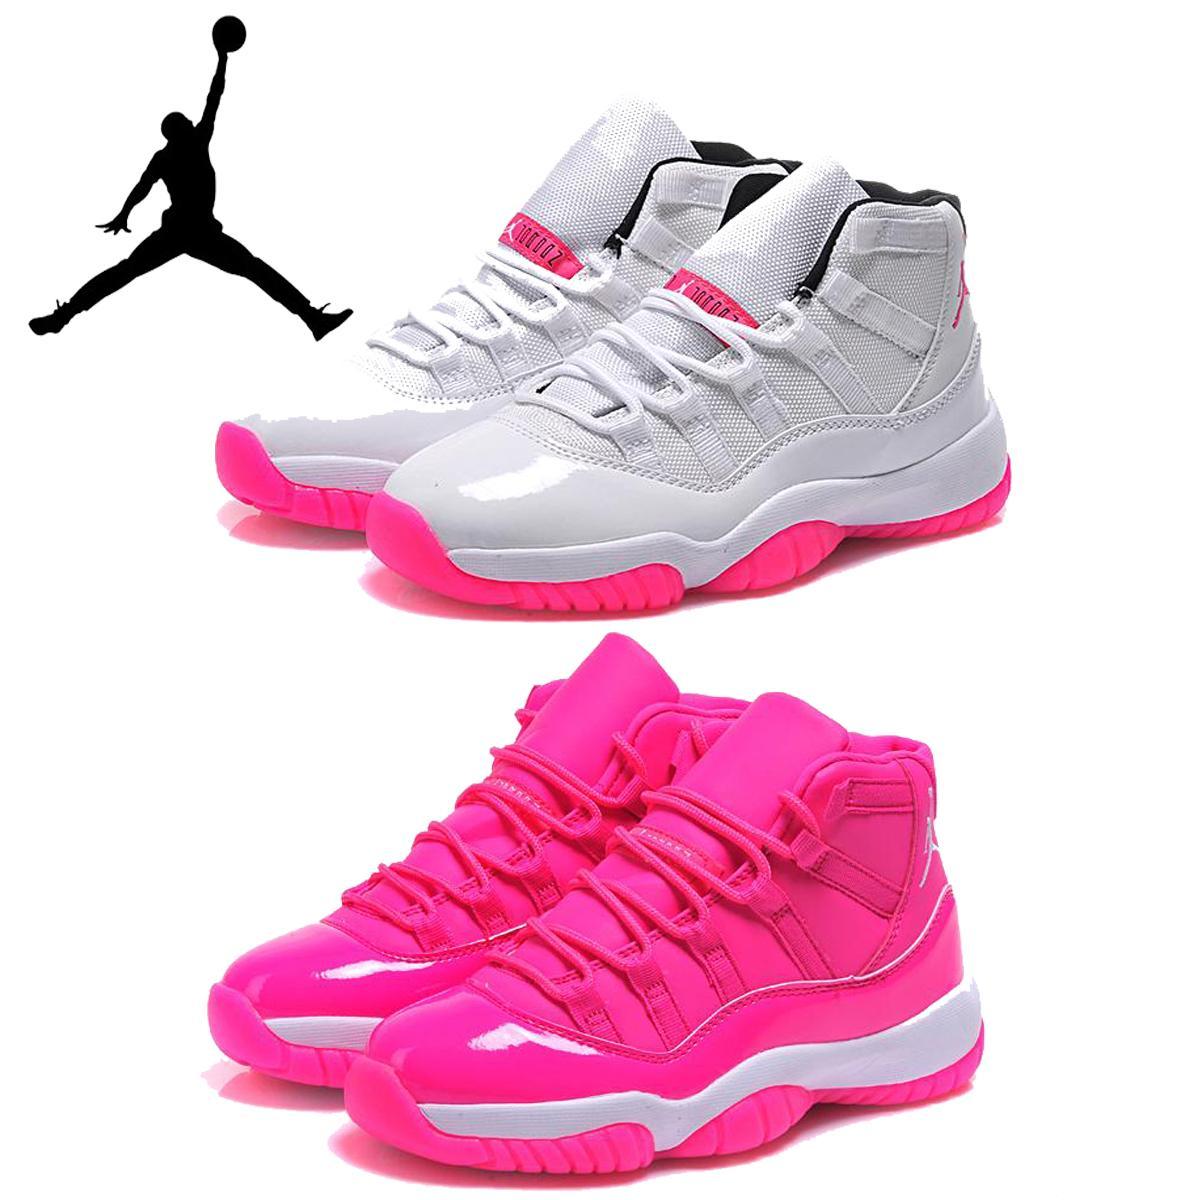 Lady Nike Air Jordan 11 Basketball Shoes Womens Retros Xi